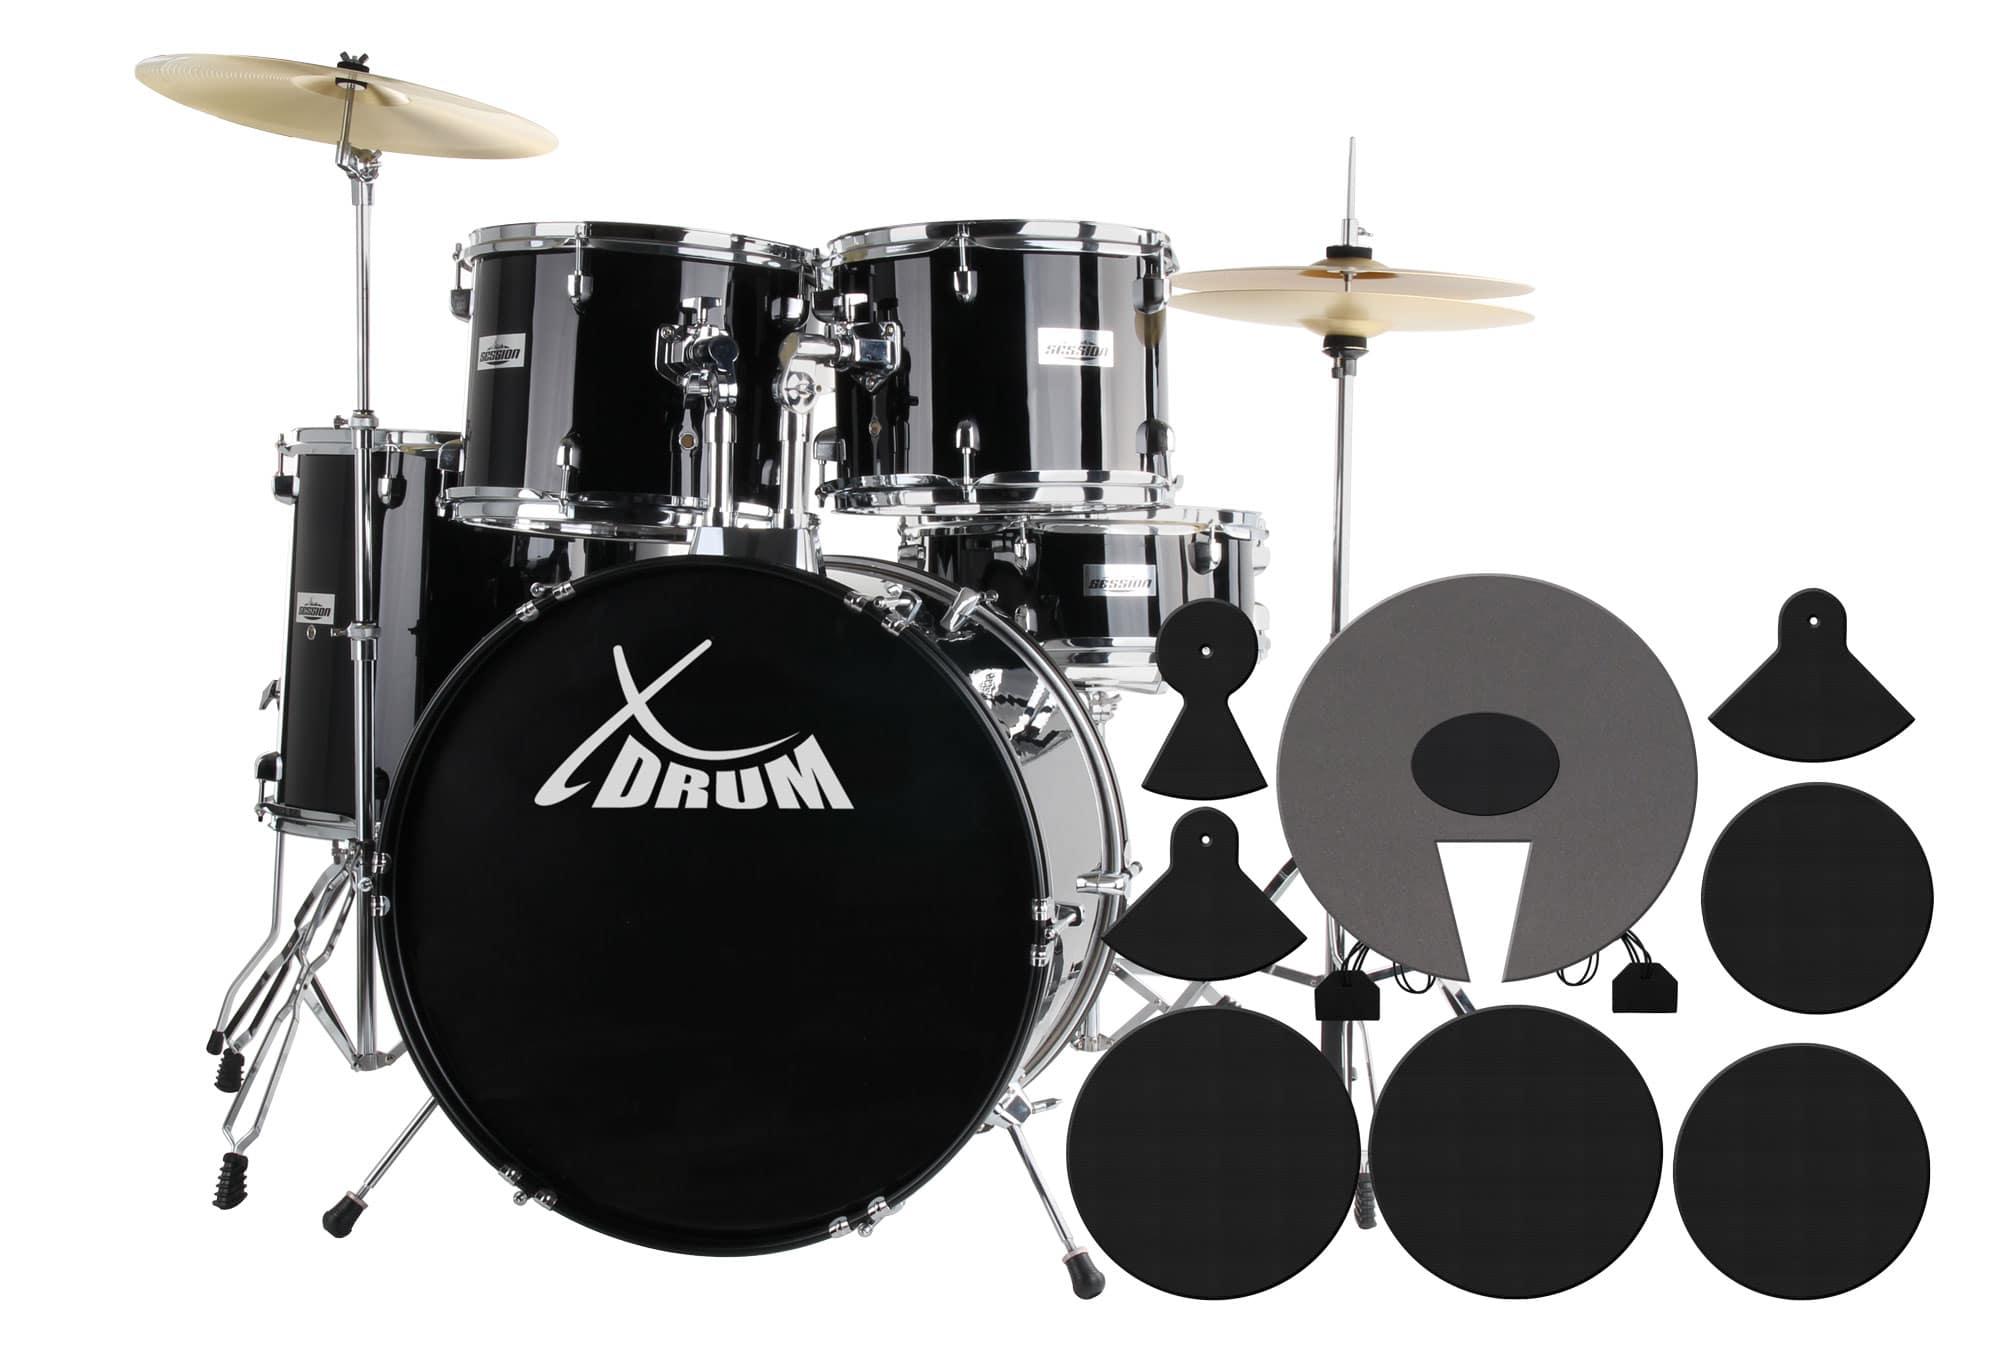 XDrum Semi 20' Studio Schlagzeug Black SET inkl. Schlagzeugdämpferset Übungsgummi Schule DVD